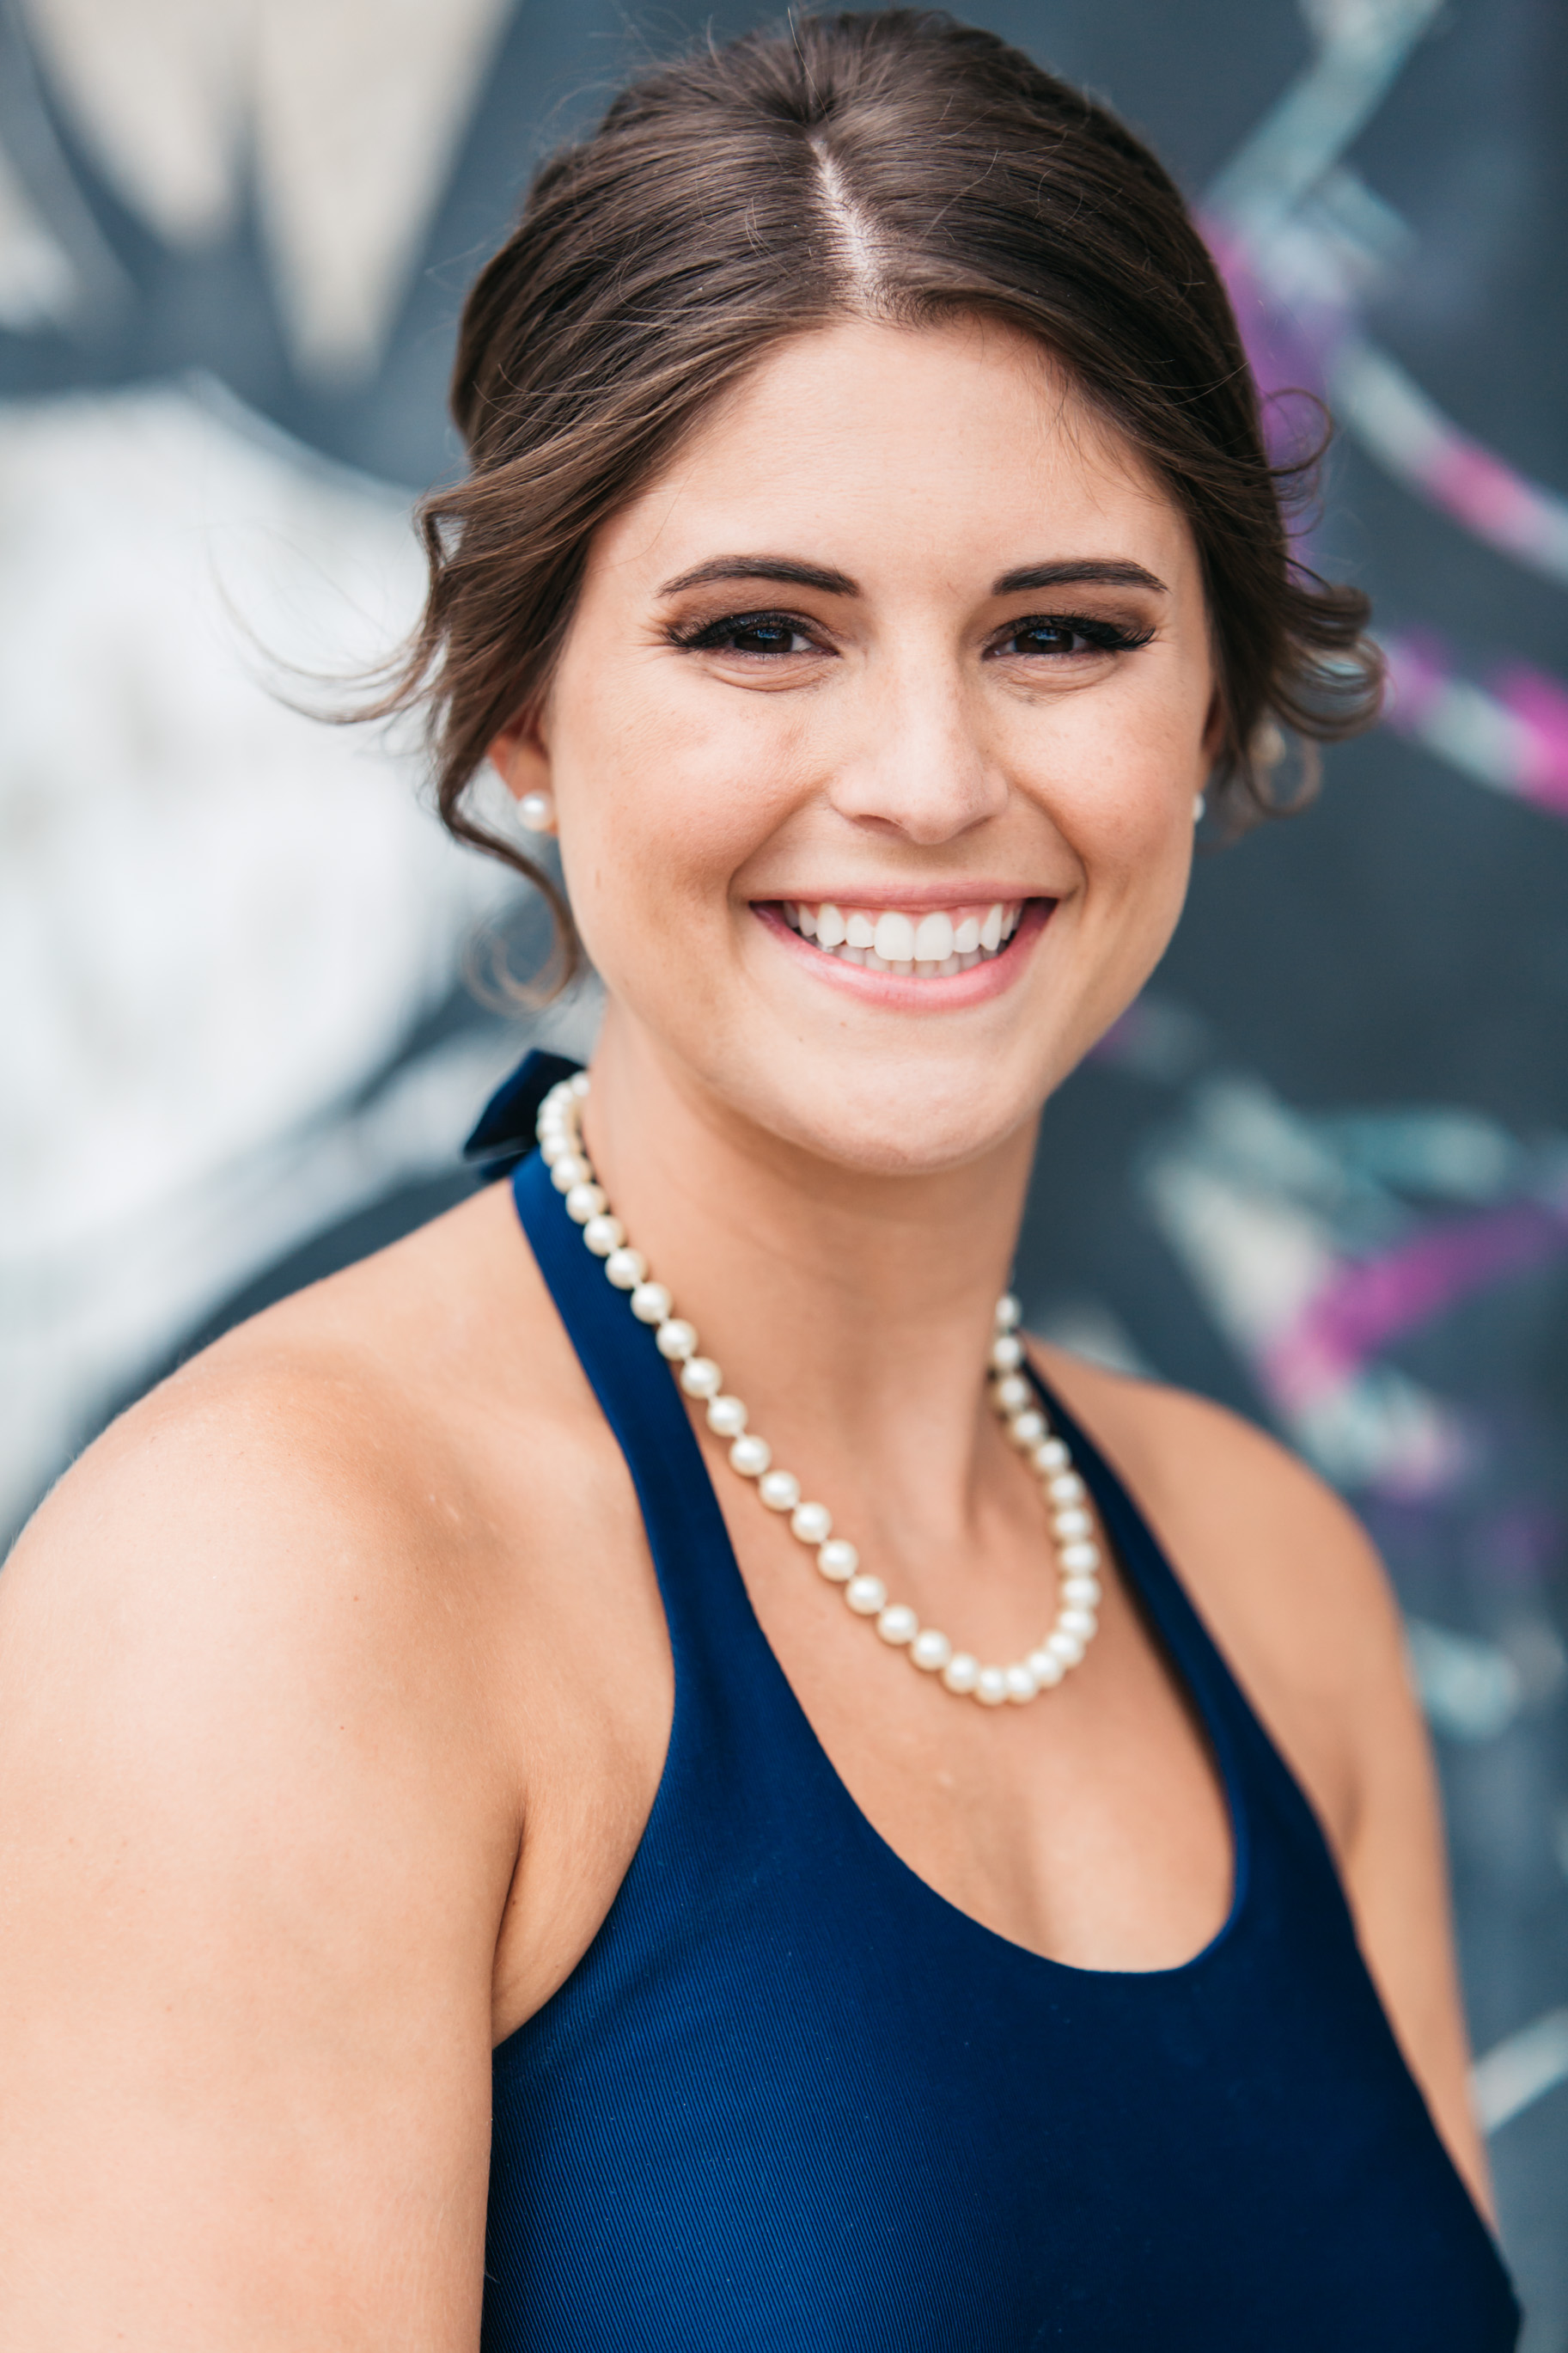 bridesmaid individual photo denver